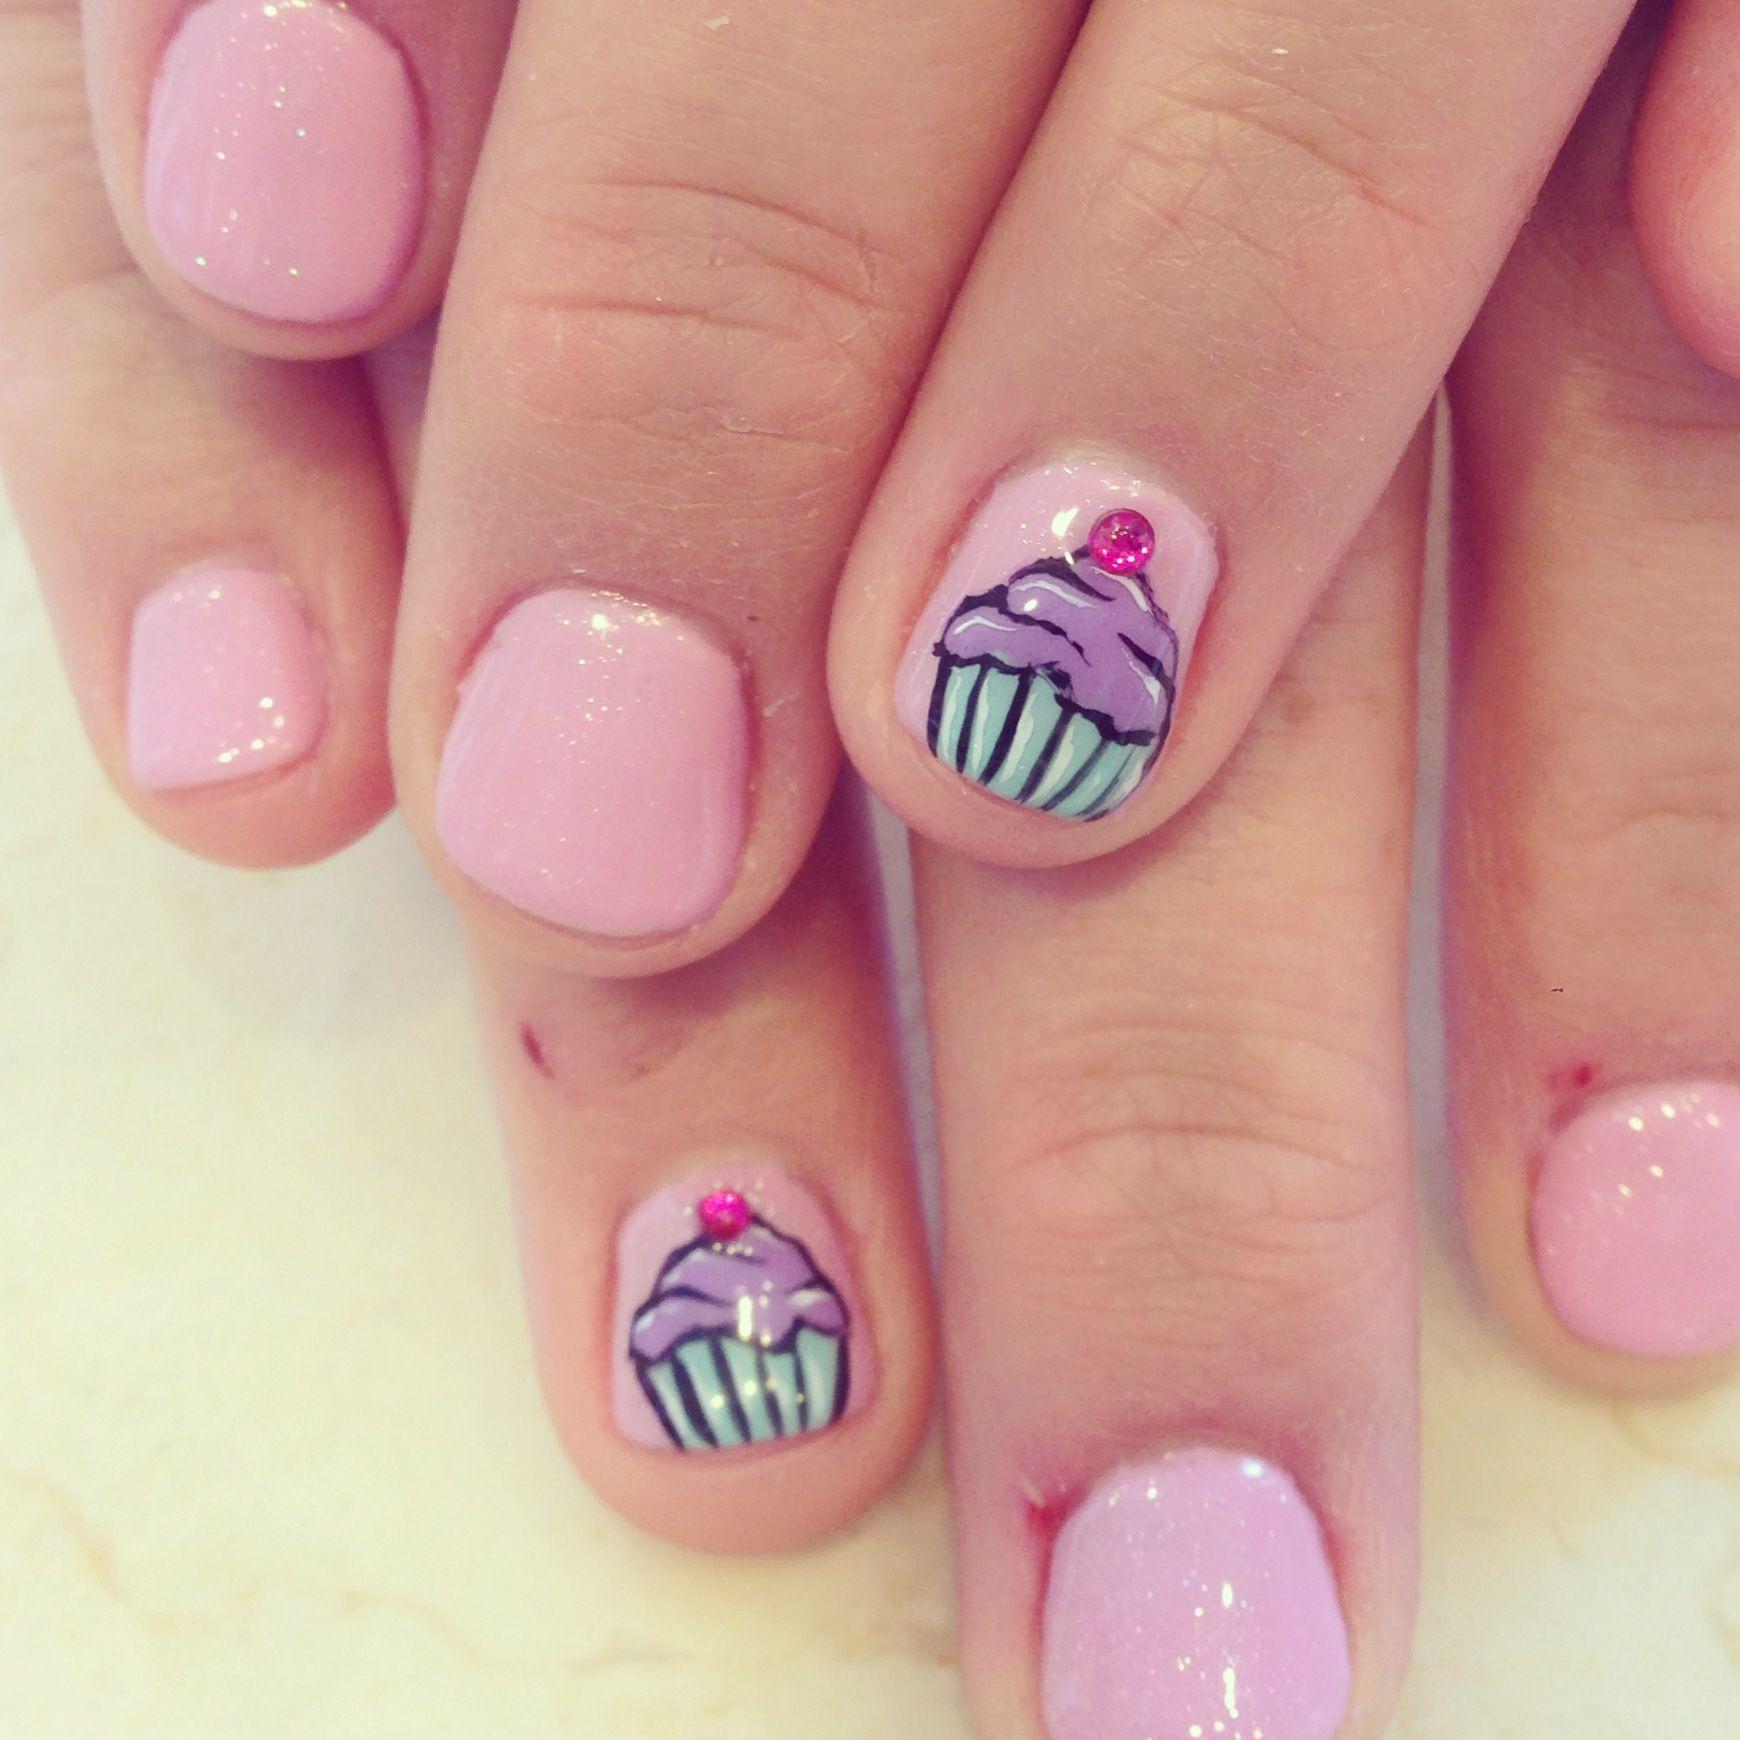 Cupcake Nail Art For Birthdays Style Pinterest Nails Nail Art